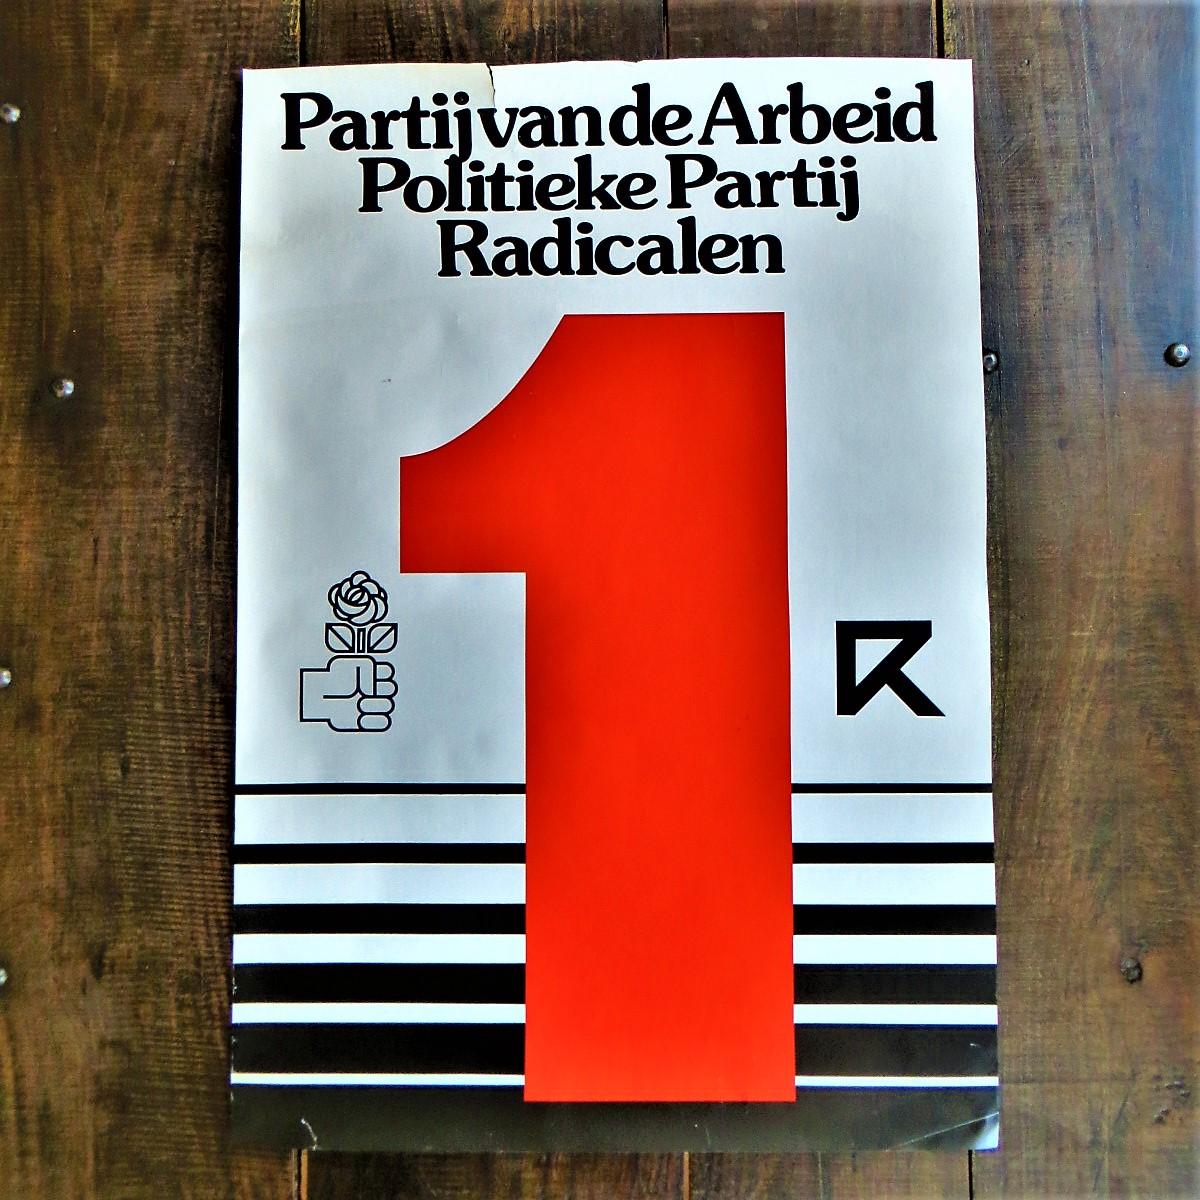 poster-pvda-politieke-partij-radicalen-1